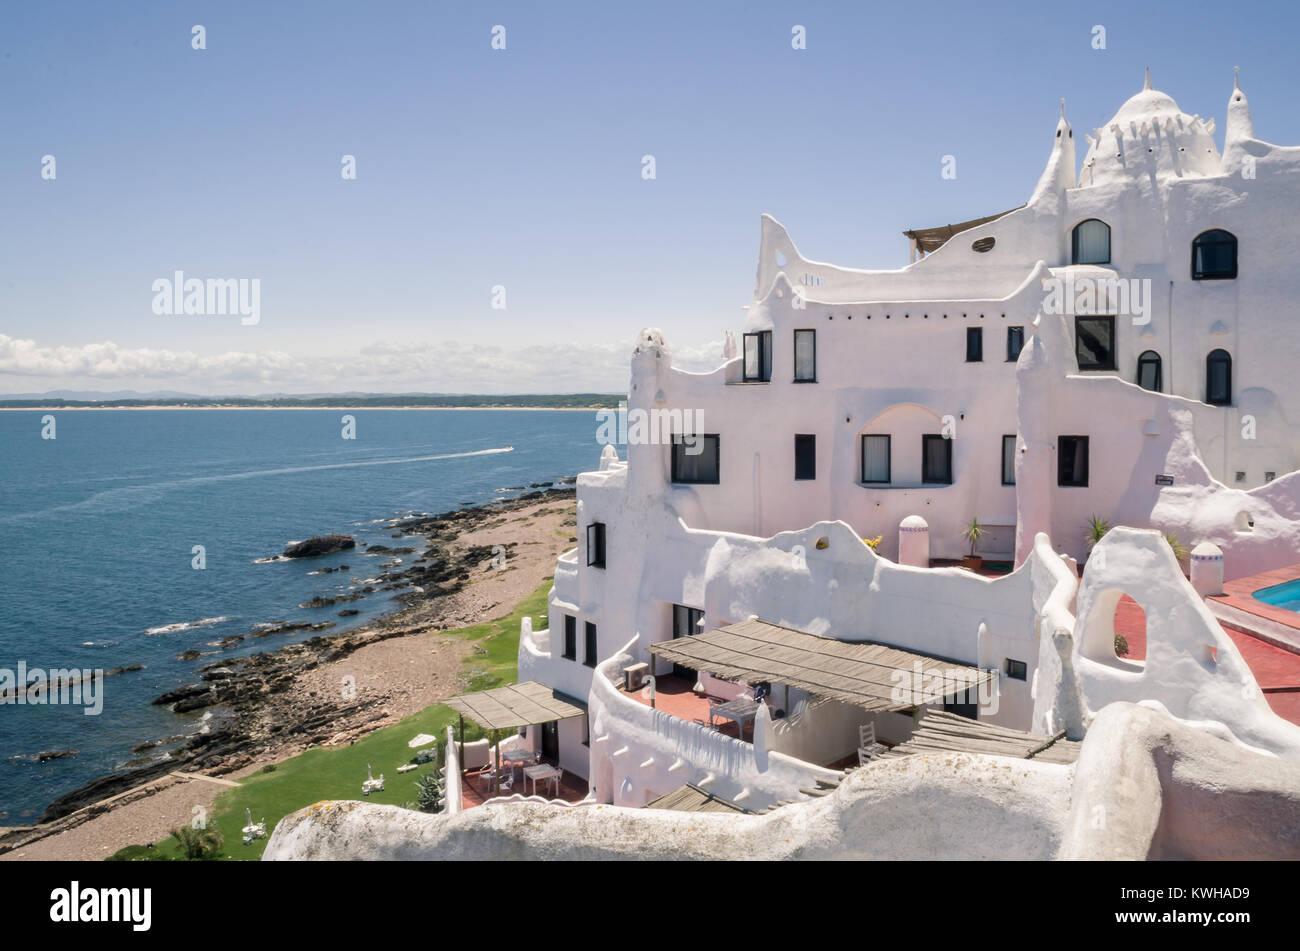 View of the sea from Punta Ballena, Punta del Este Uruguay, Casapueblo. This is a hotel and a gallery art where - Stock Image